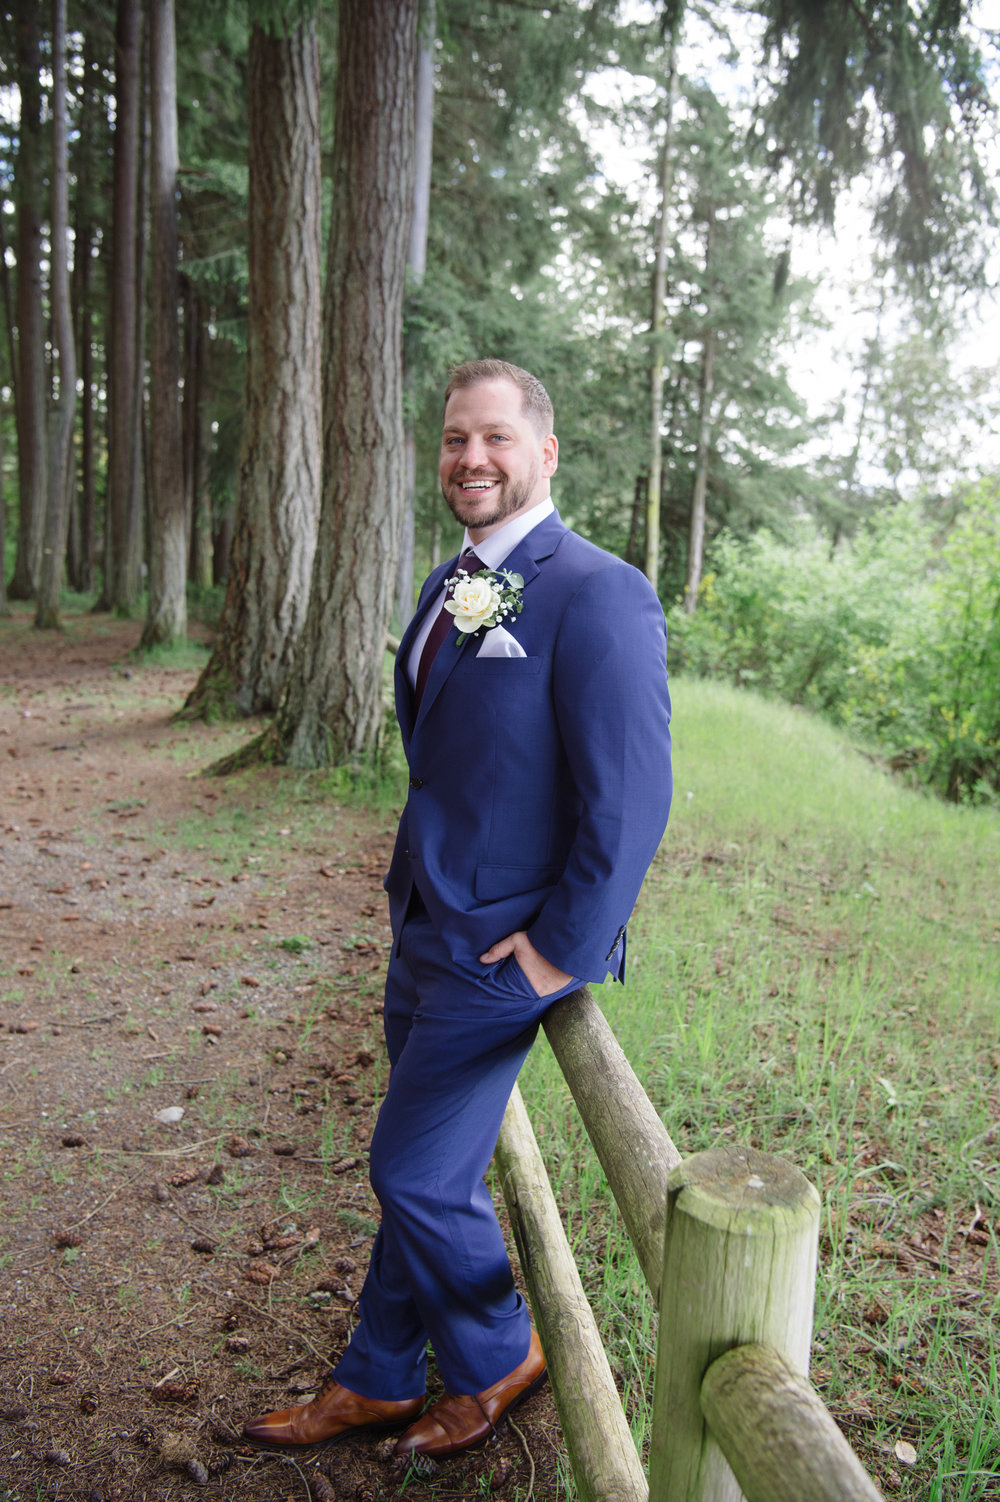 Kim La Plante + Nick Samet_Poulsbo Wedding_Kitsap Memorial Park Wedding_Kelsey Lane Photography-9065.jpg